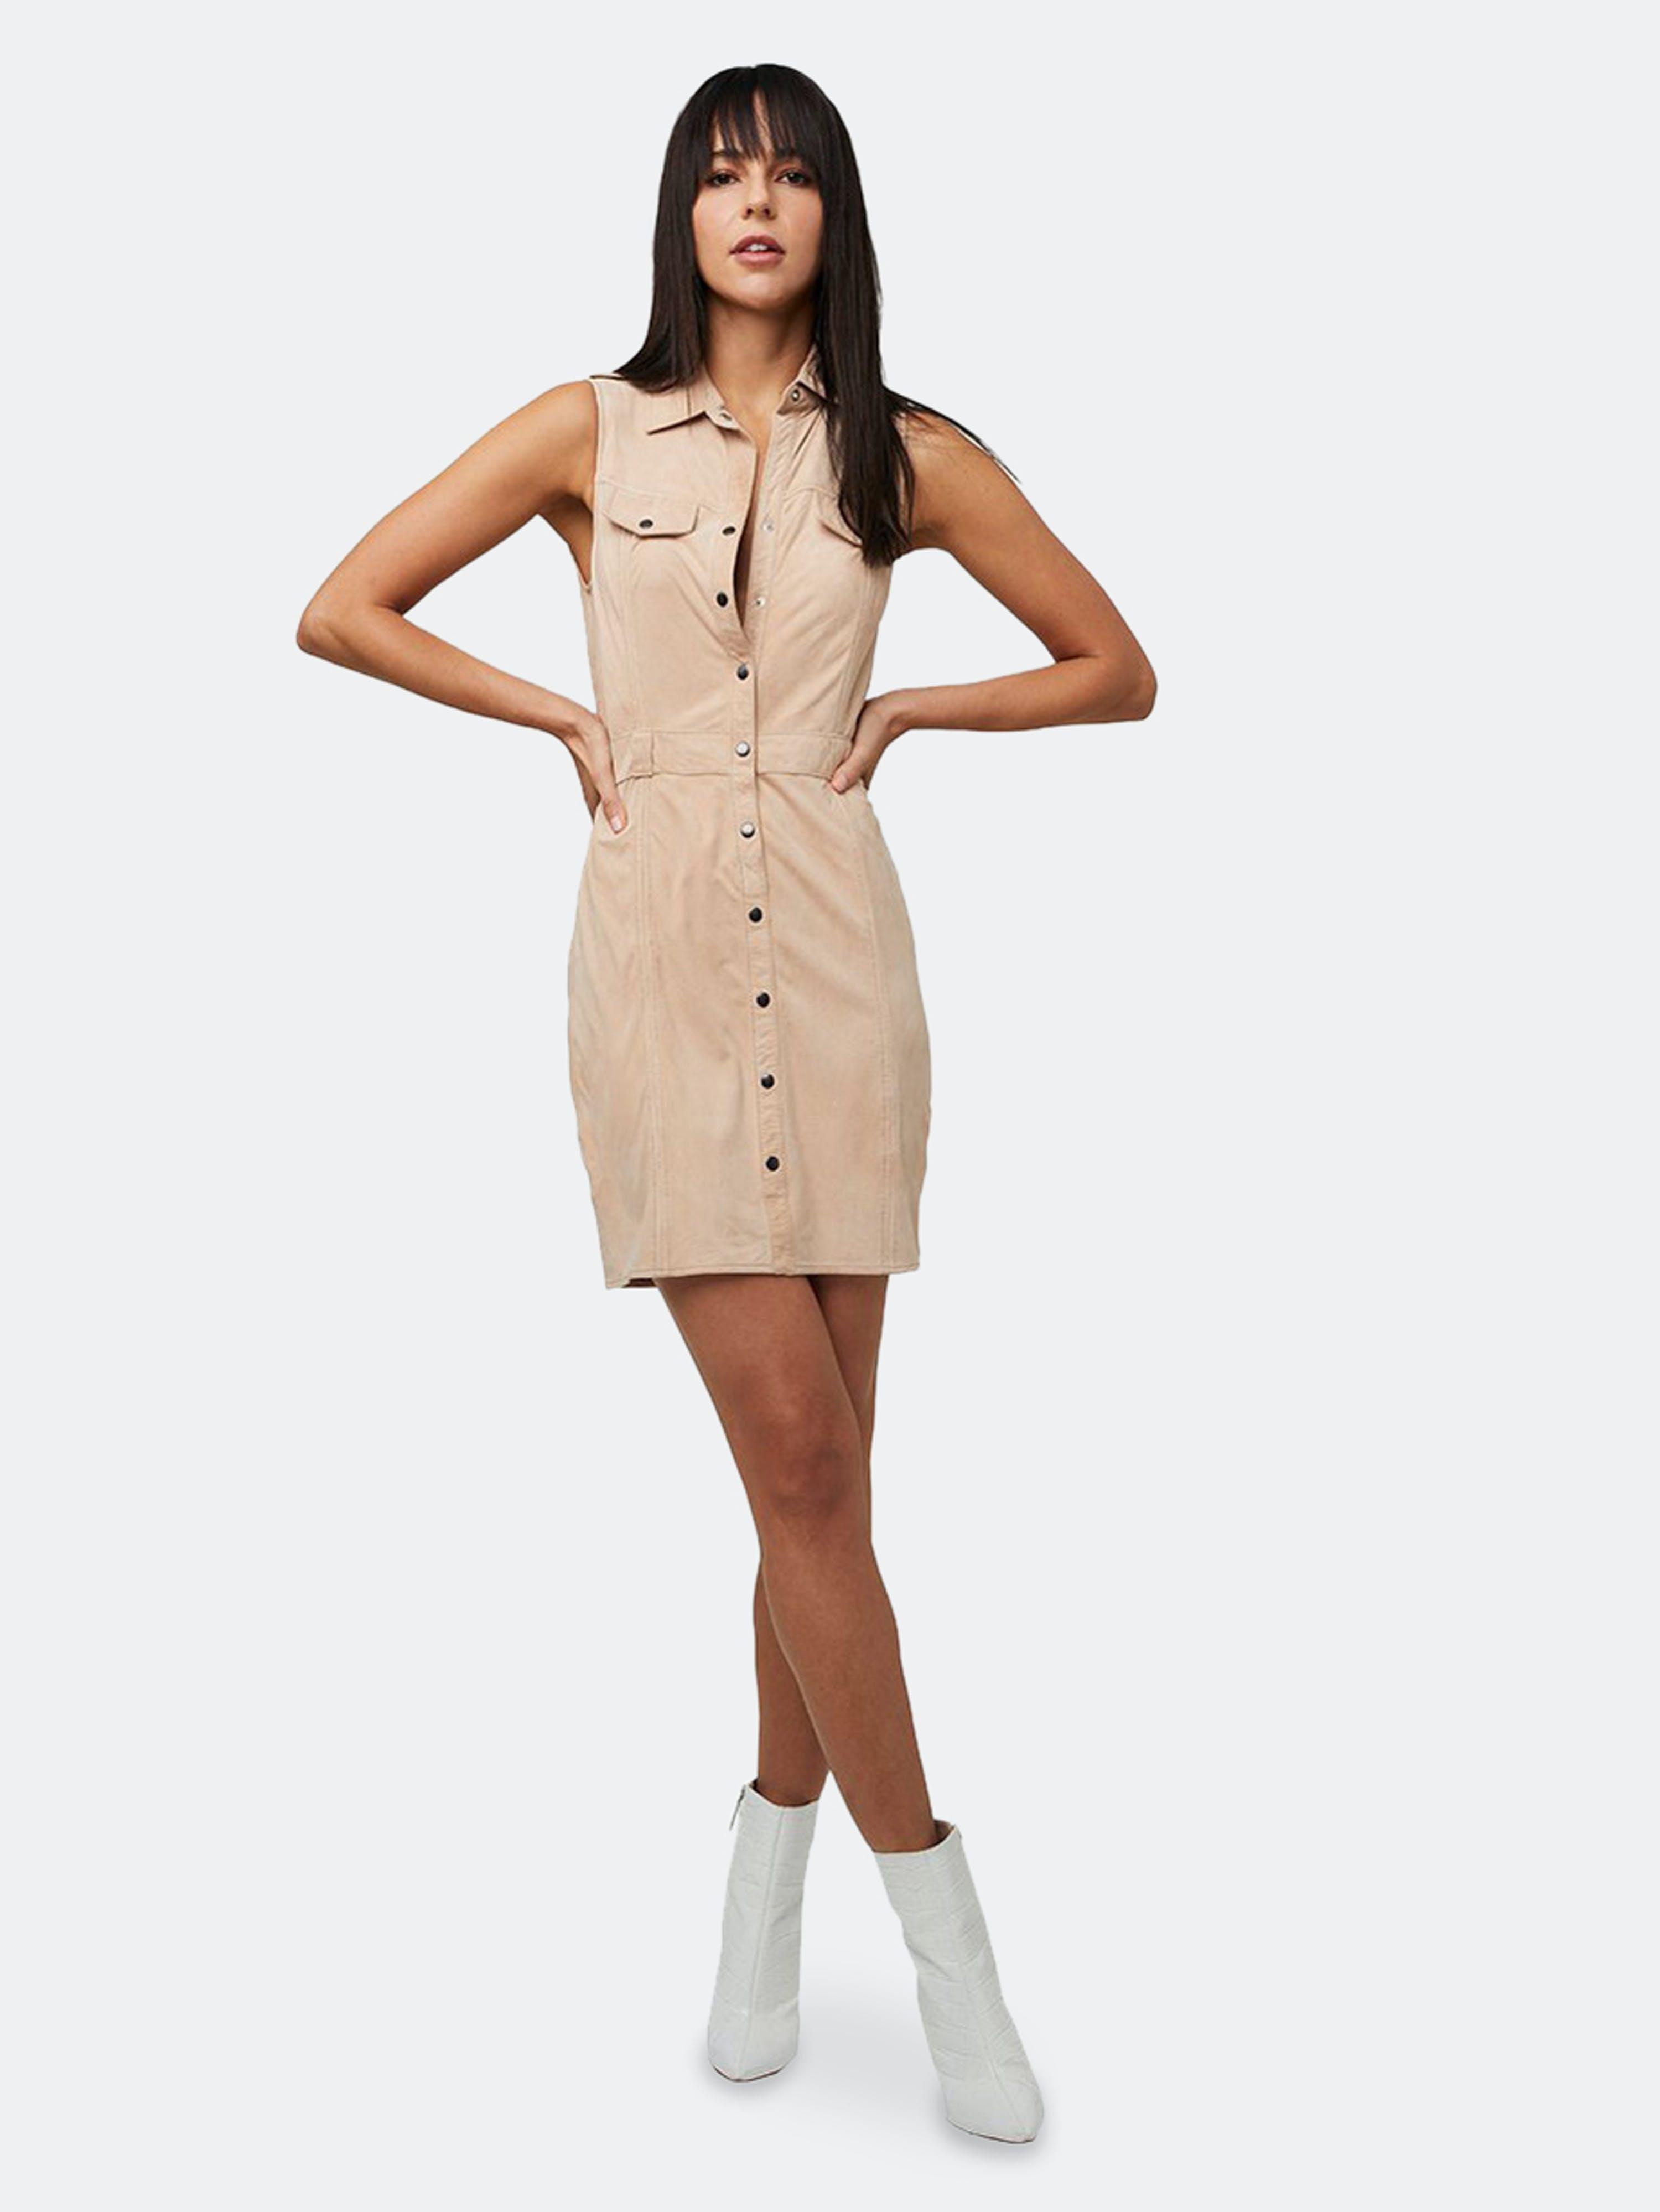 As By Df Officer Suede Dress In Brown